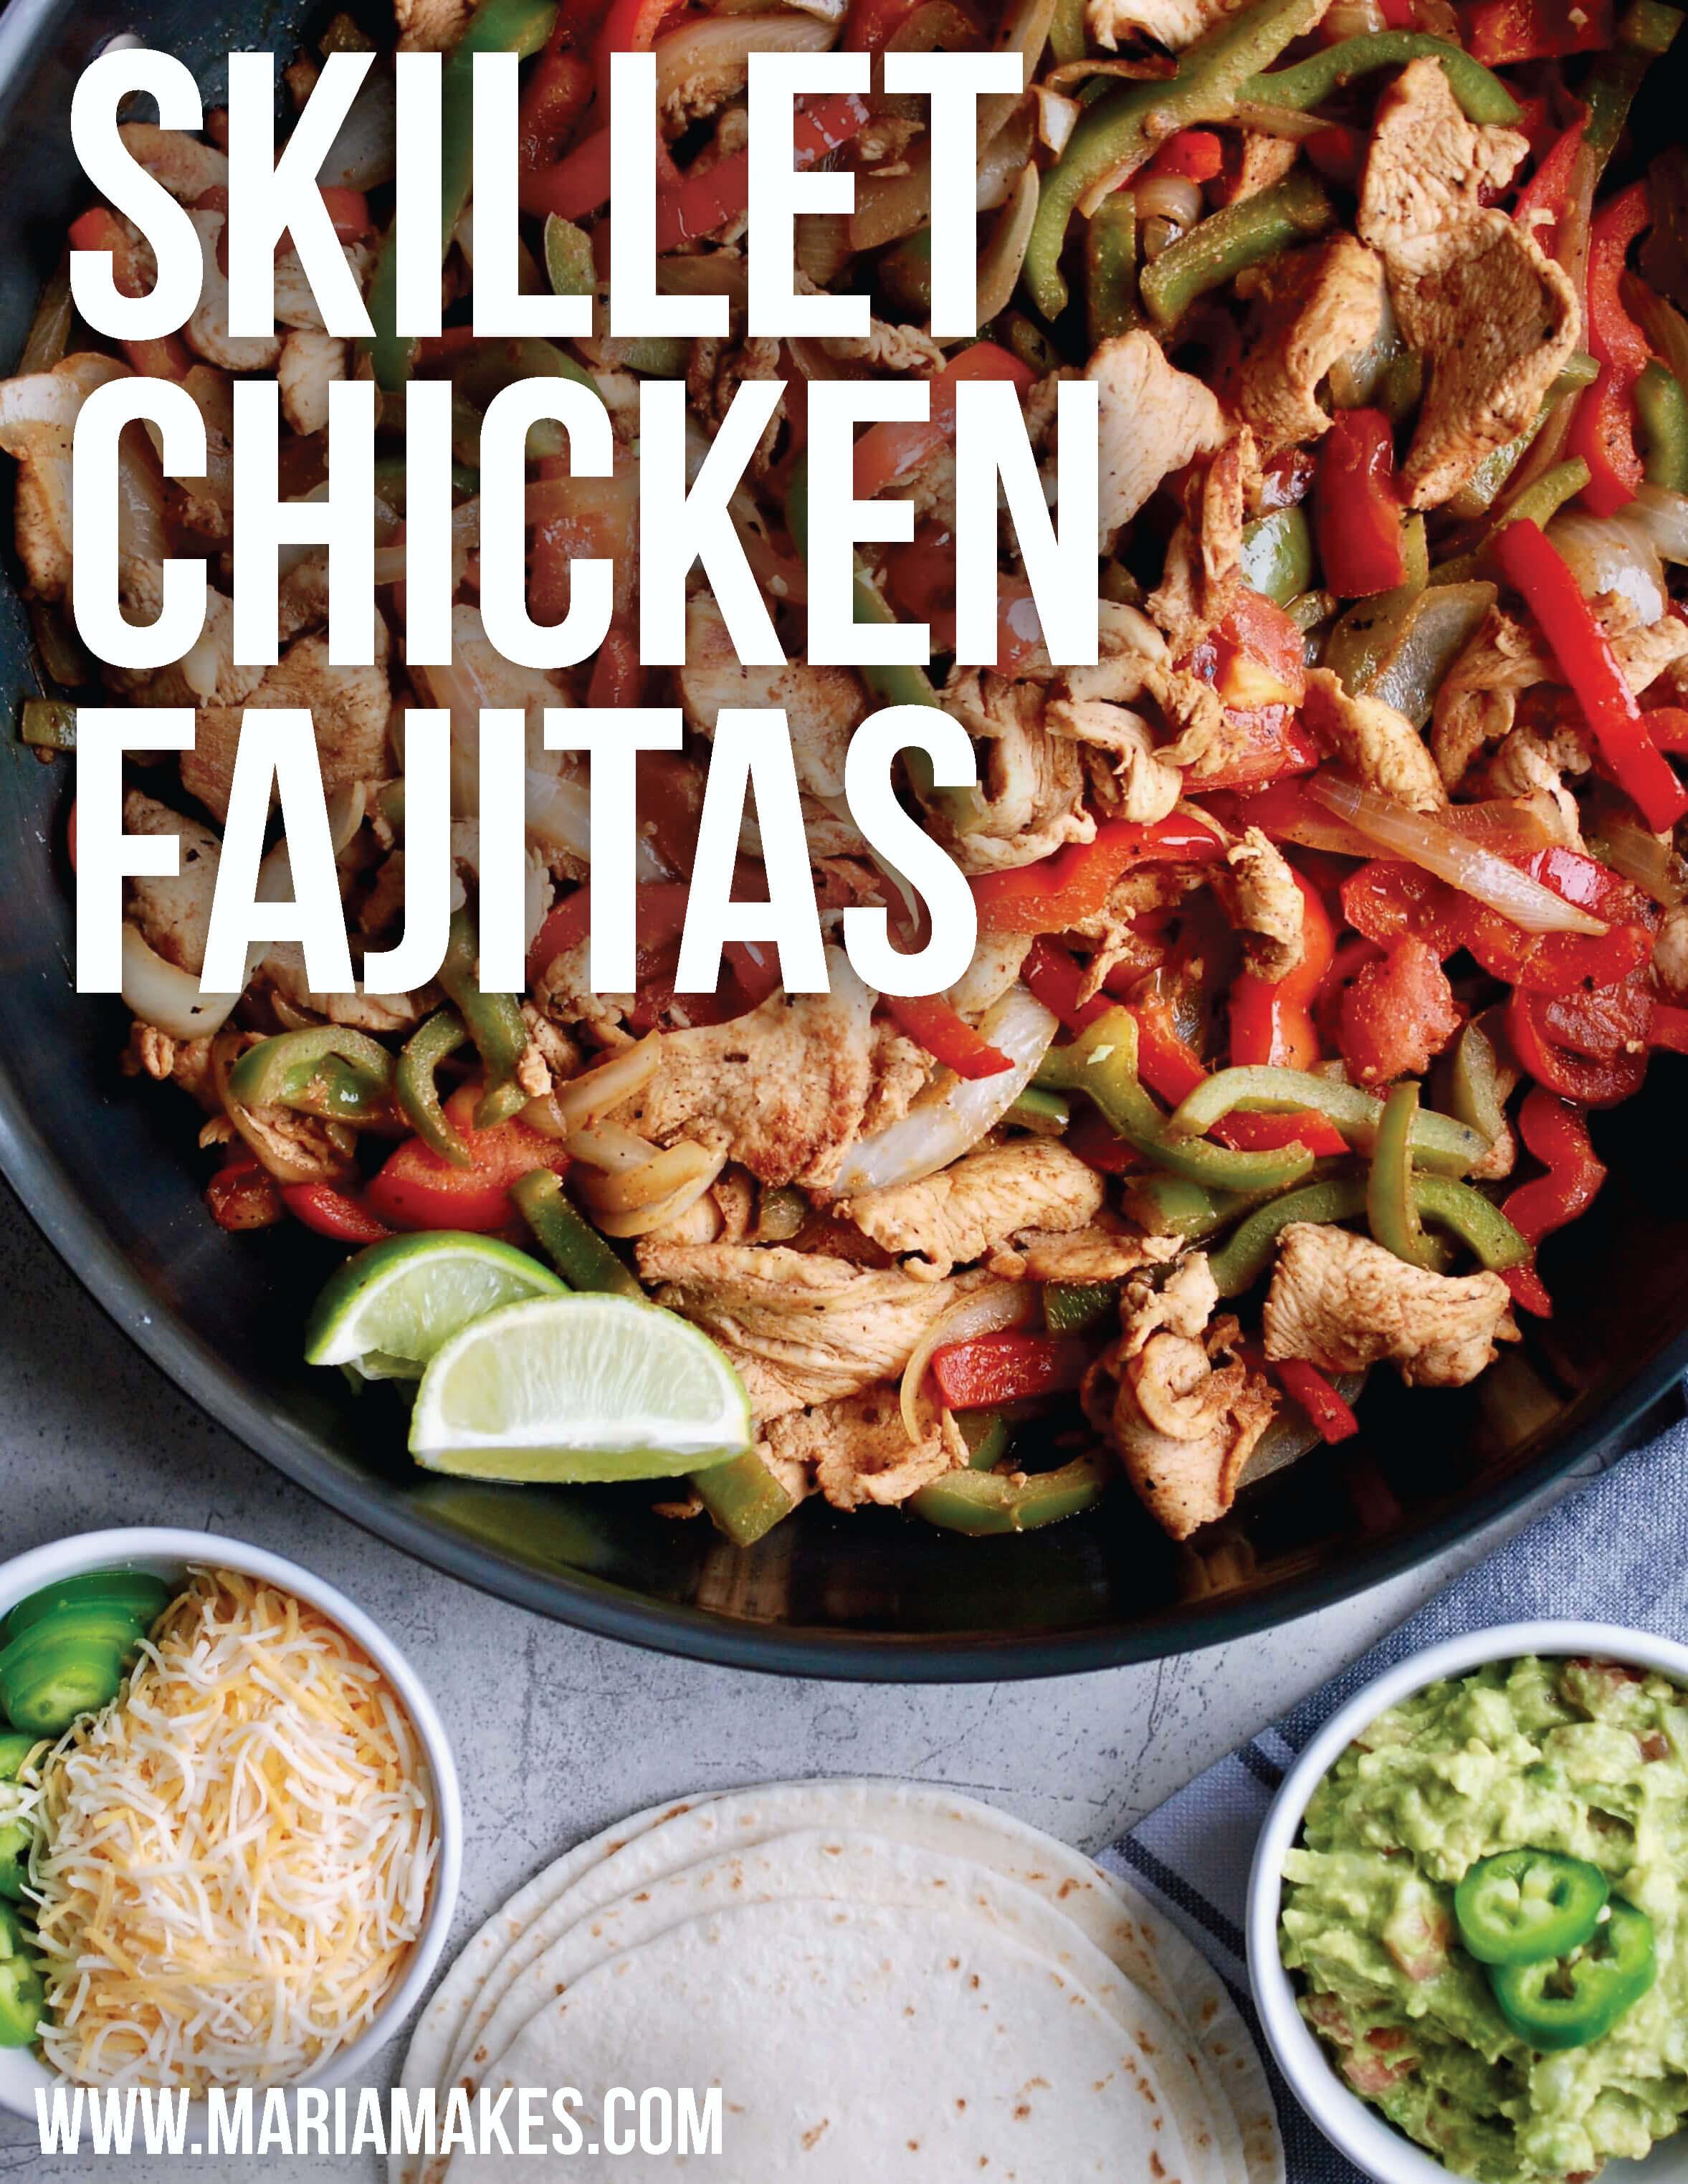 Skillet Chicken Fajitas – Maria Makes: Perfectly seasoned, make 'em at home, Mexican takeout chicken fajitas. Serve with tortillas or as fajita bowls!